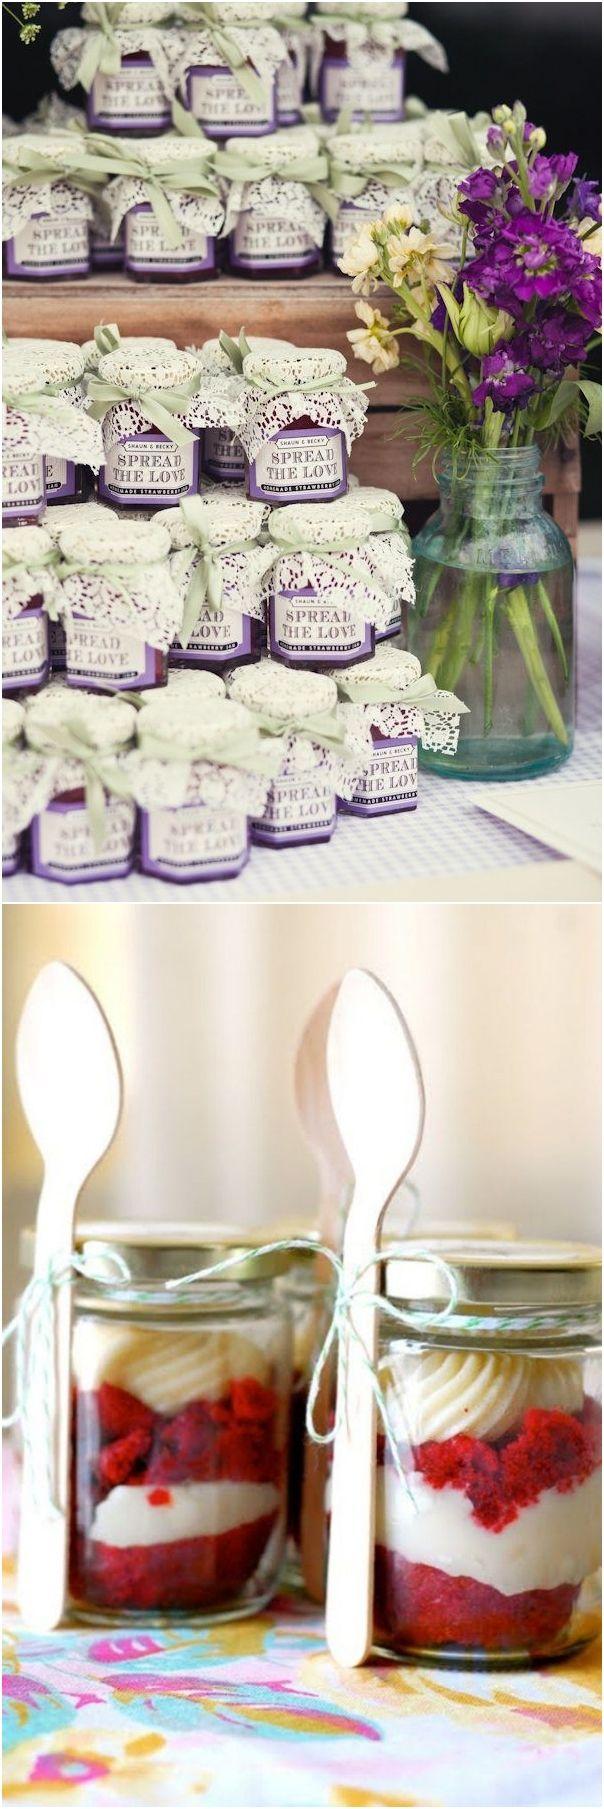 25 Cute and Easy Wedding Favor Ideas   Wedding favors cheap, Unique ...